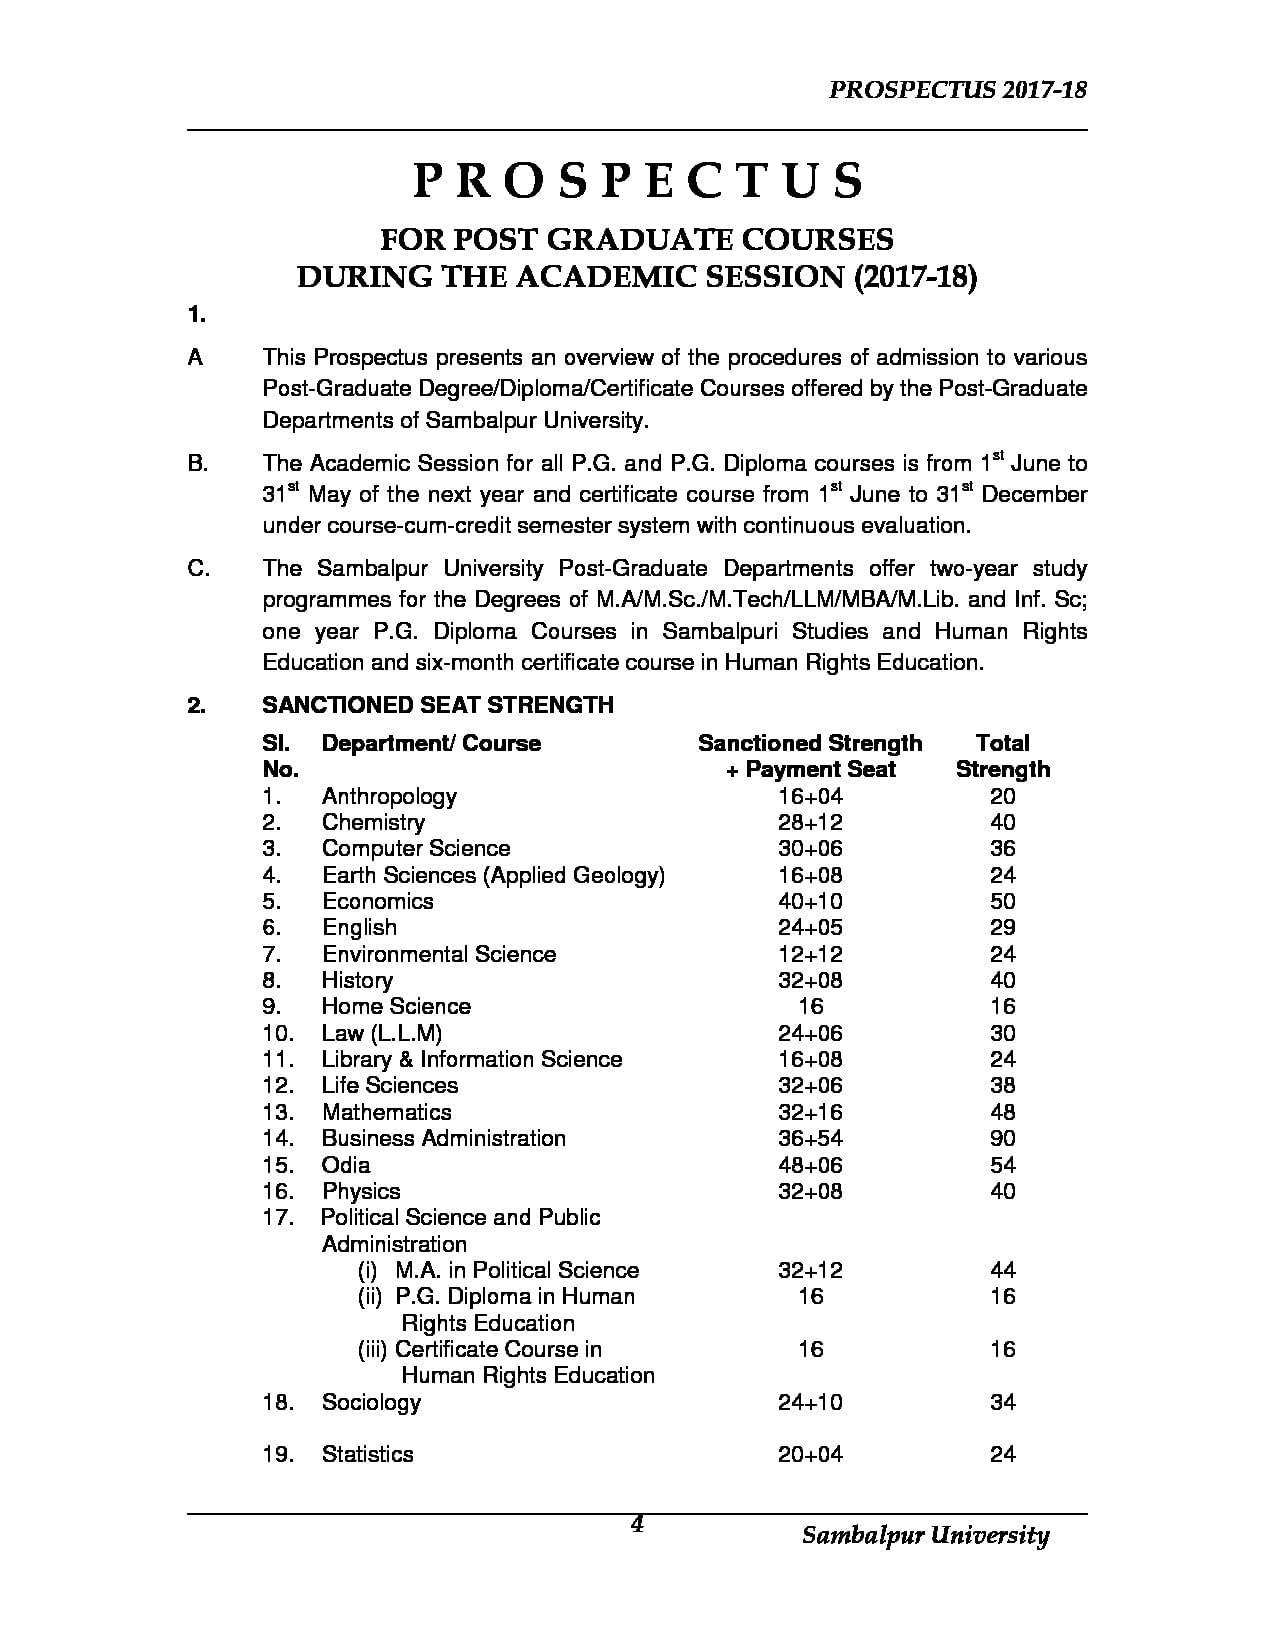 Sambalpur University Sambalpur Admissions Contact Website Facilities 2019 2020